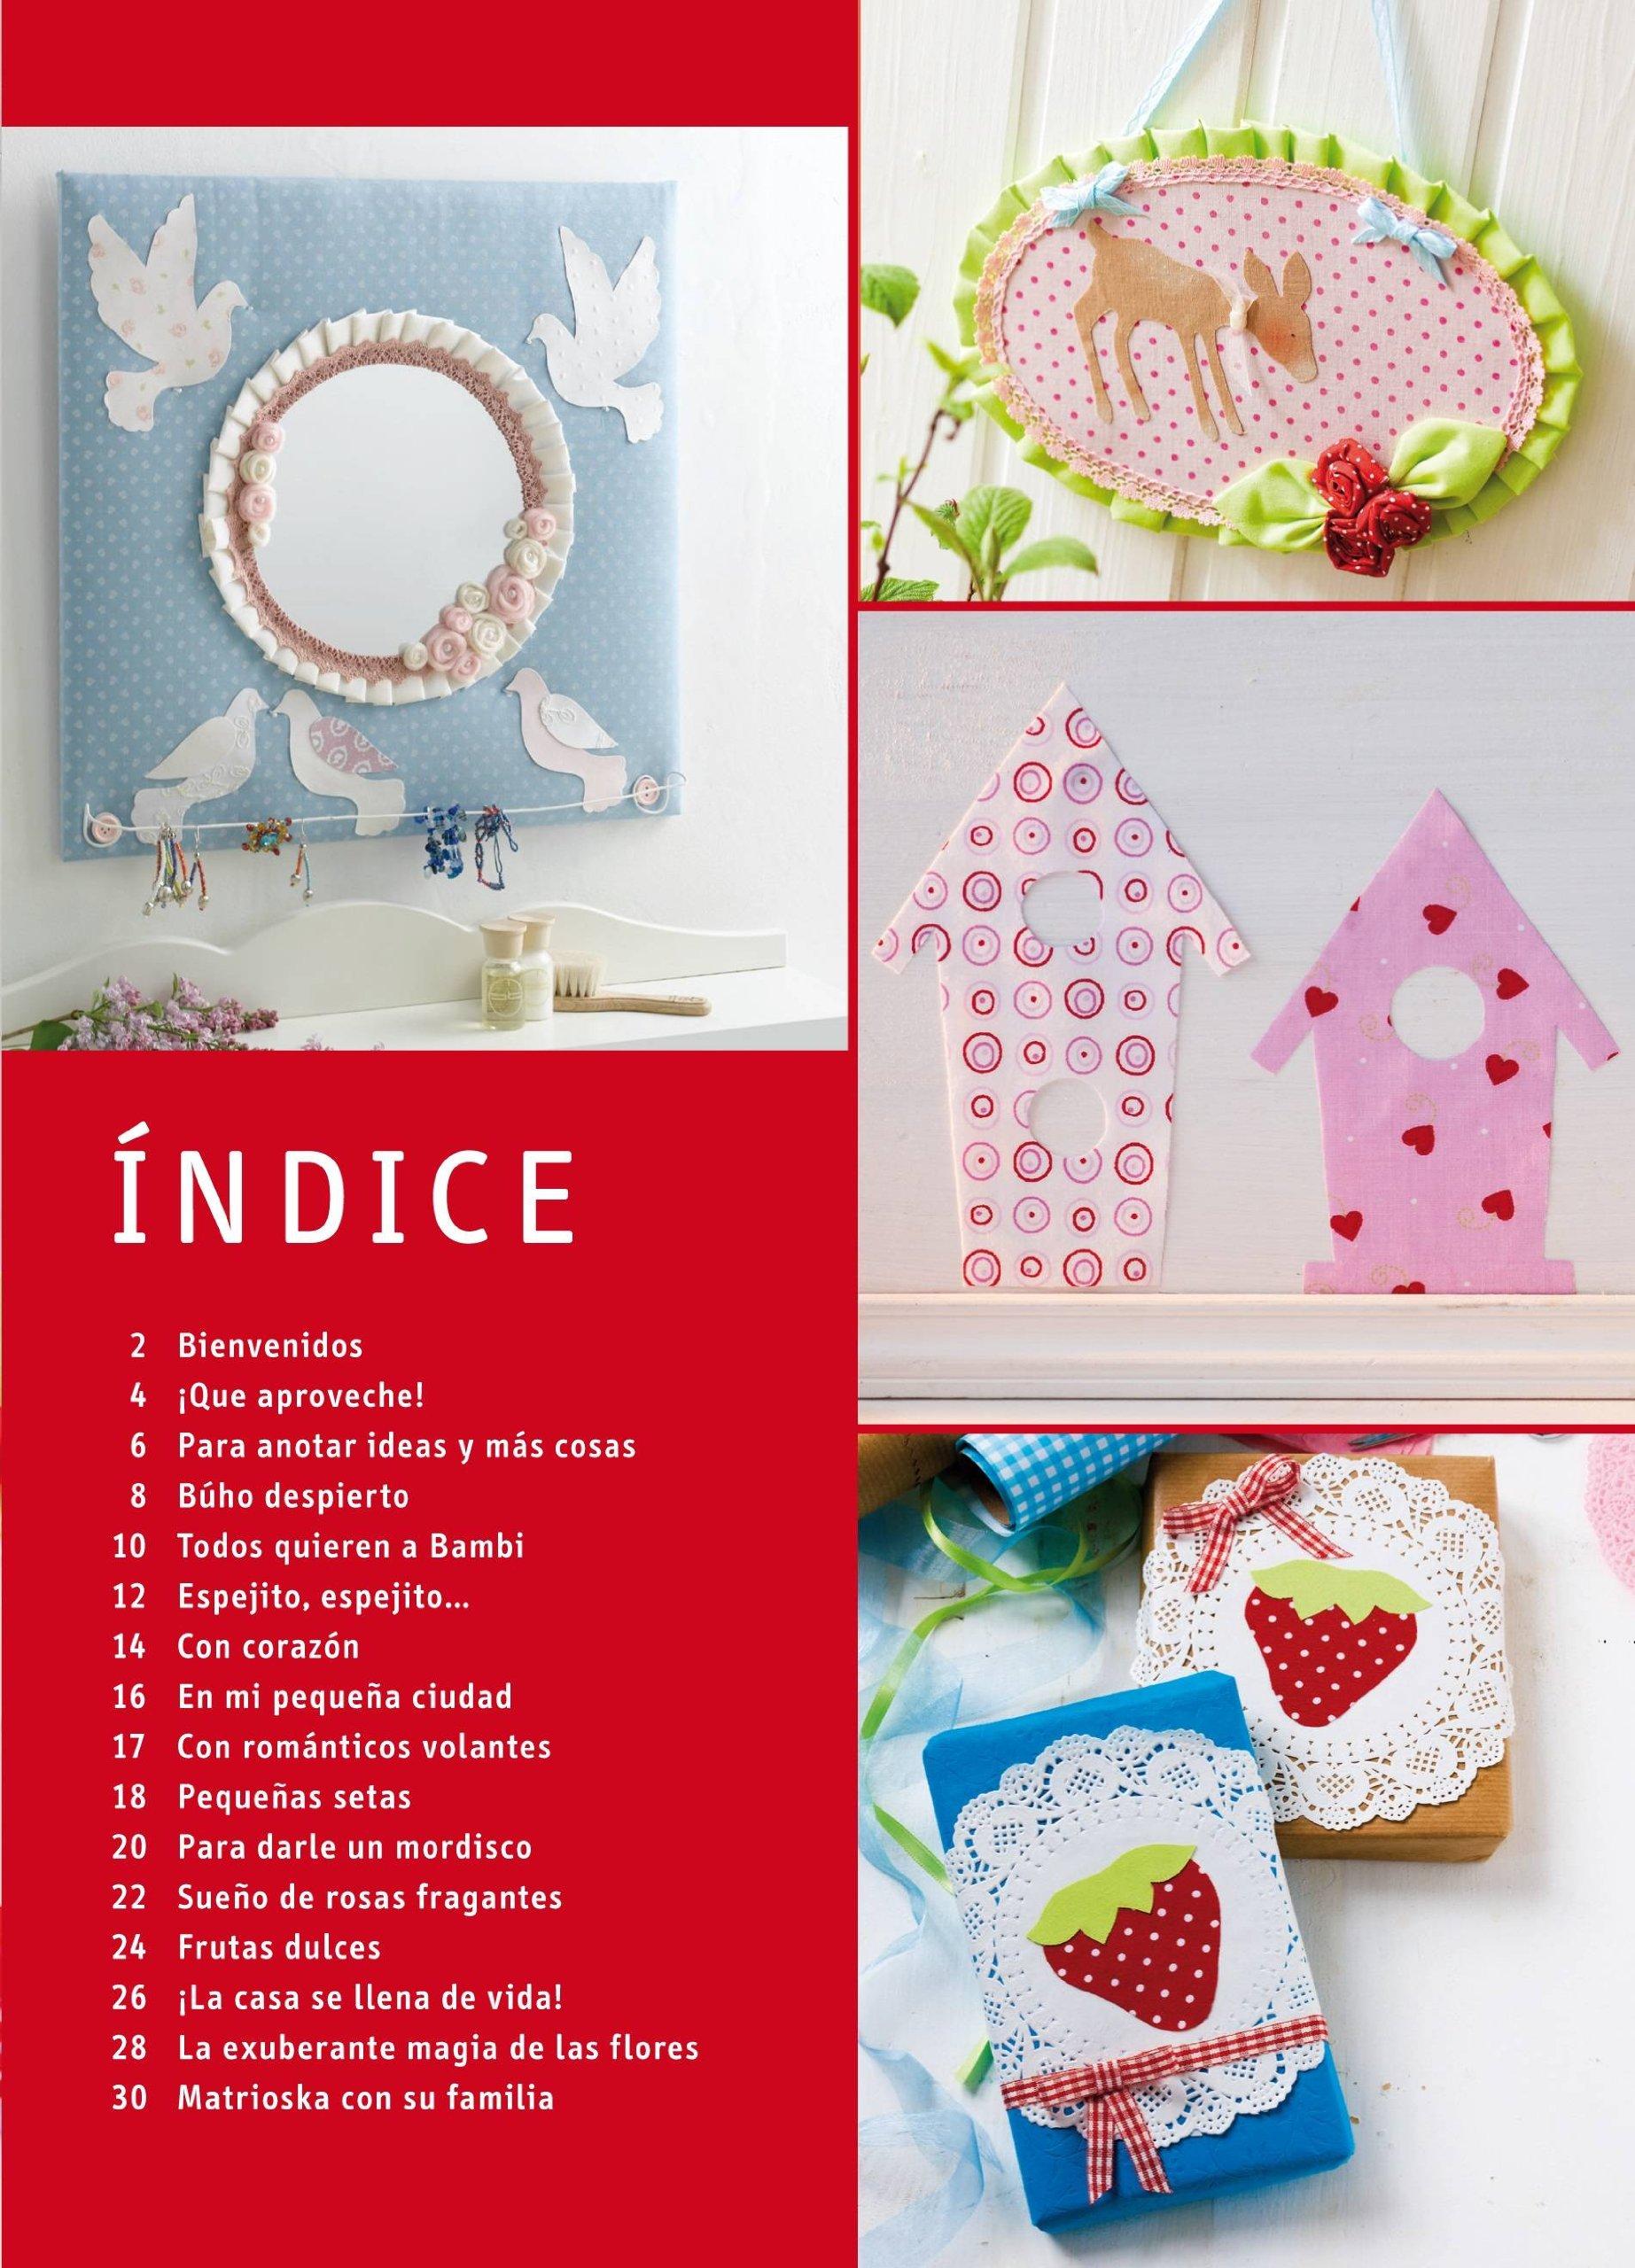 Ideas para decorar la casa con telas sin usar hilo ni aguja: Katrin Kluger: 9788498743838: Amazon.com: Books